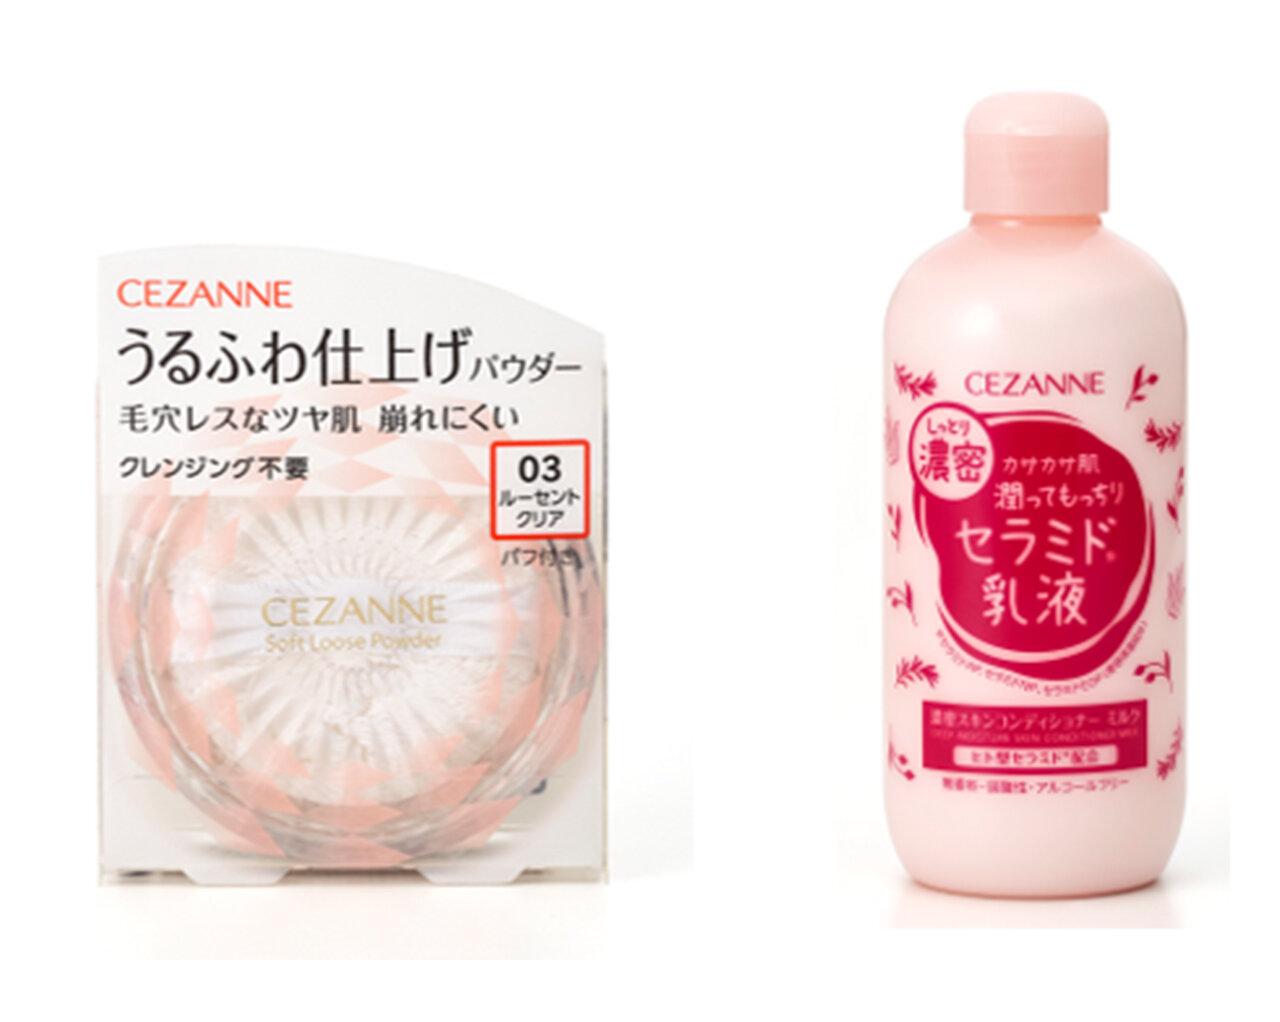 CEZANNE/セザンヌ 2021秋新作コスメ